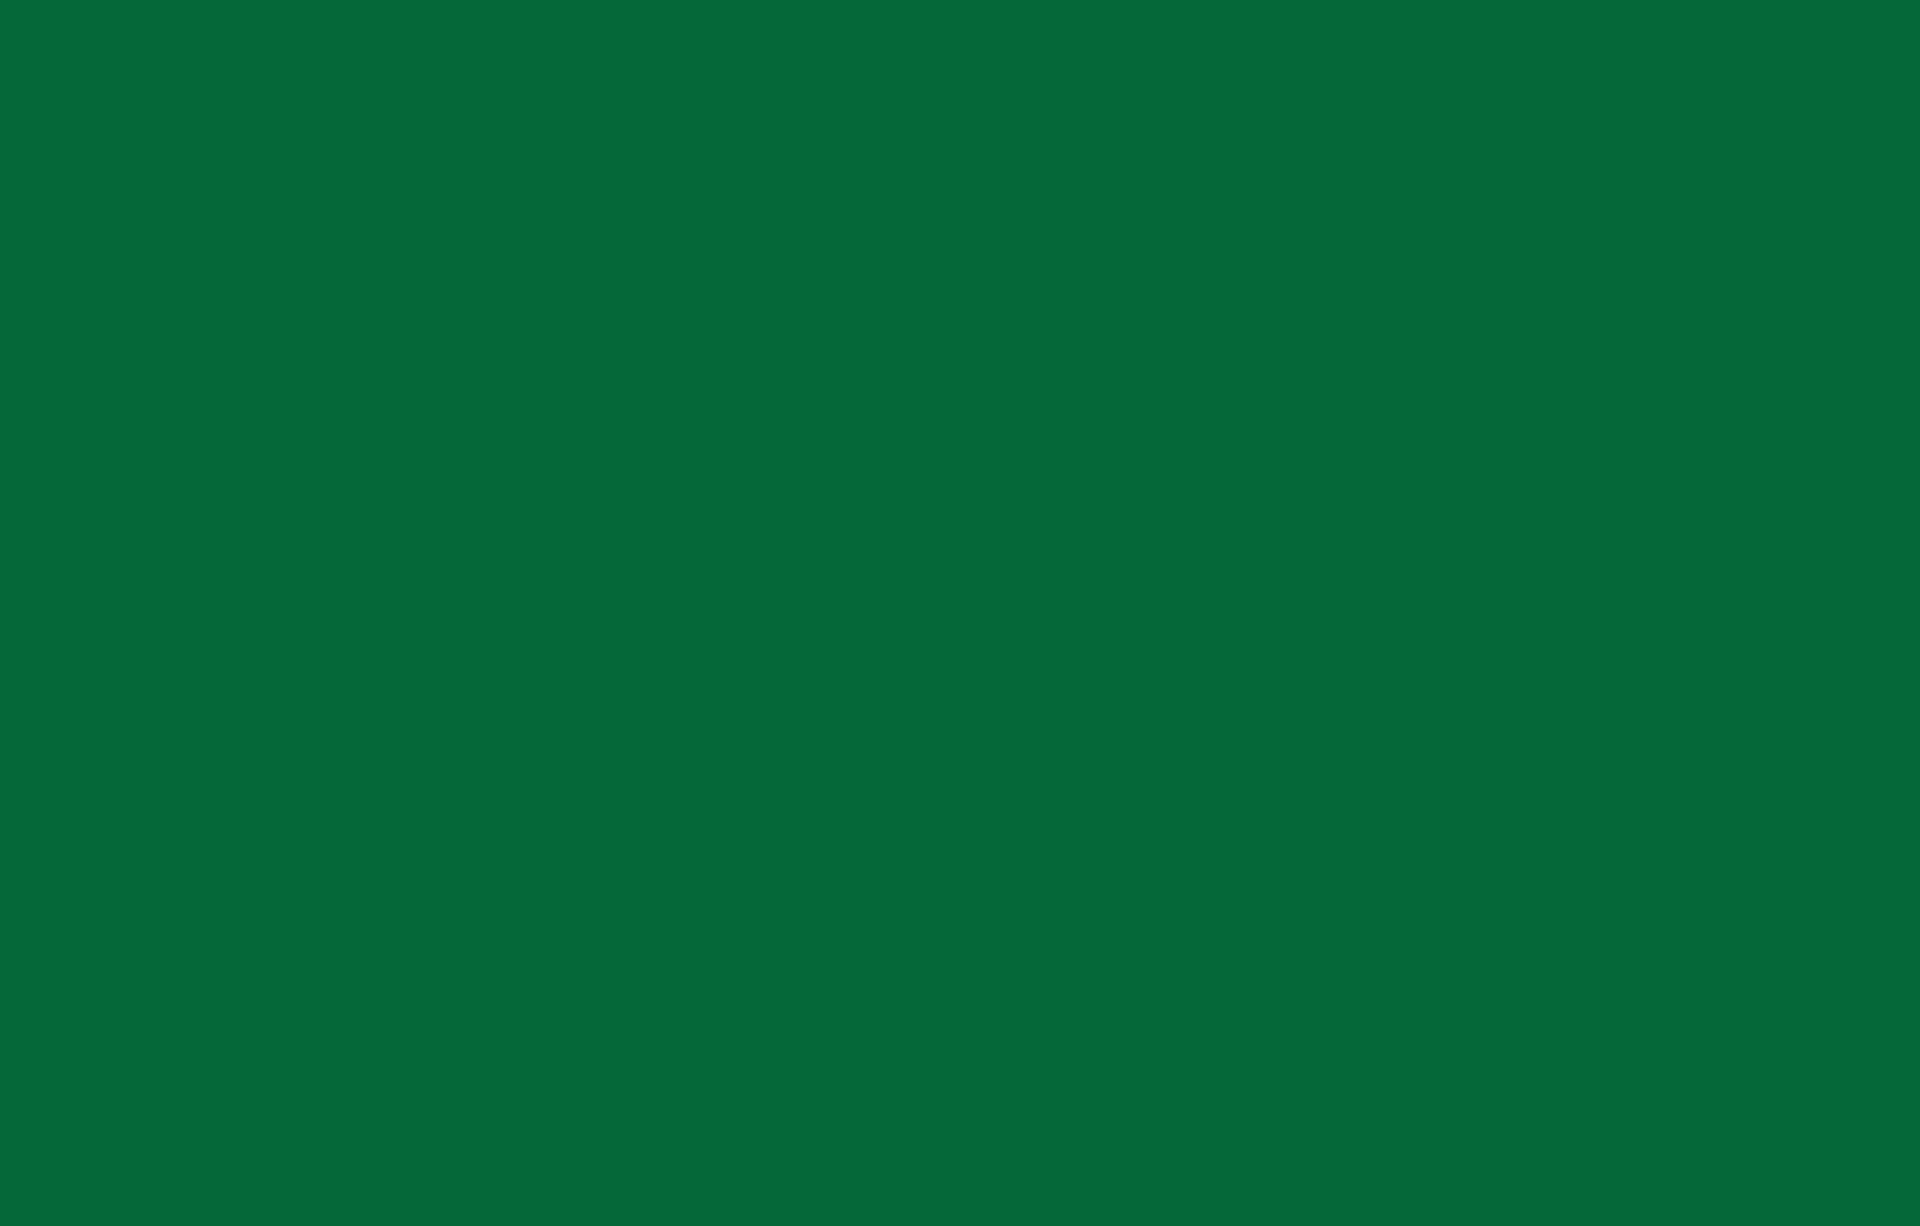 Upcoming Alternative Fuel & Electric Vehicle Webinars